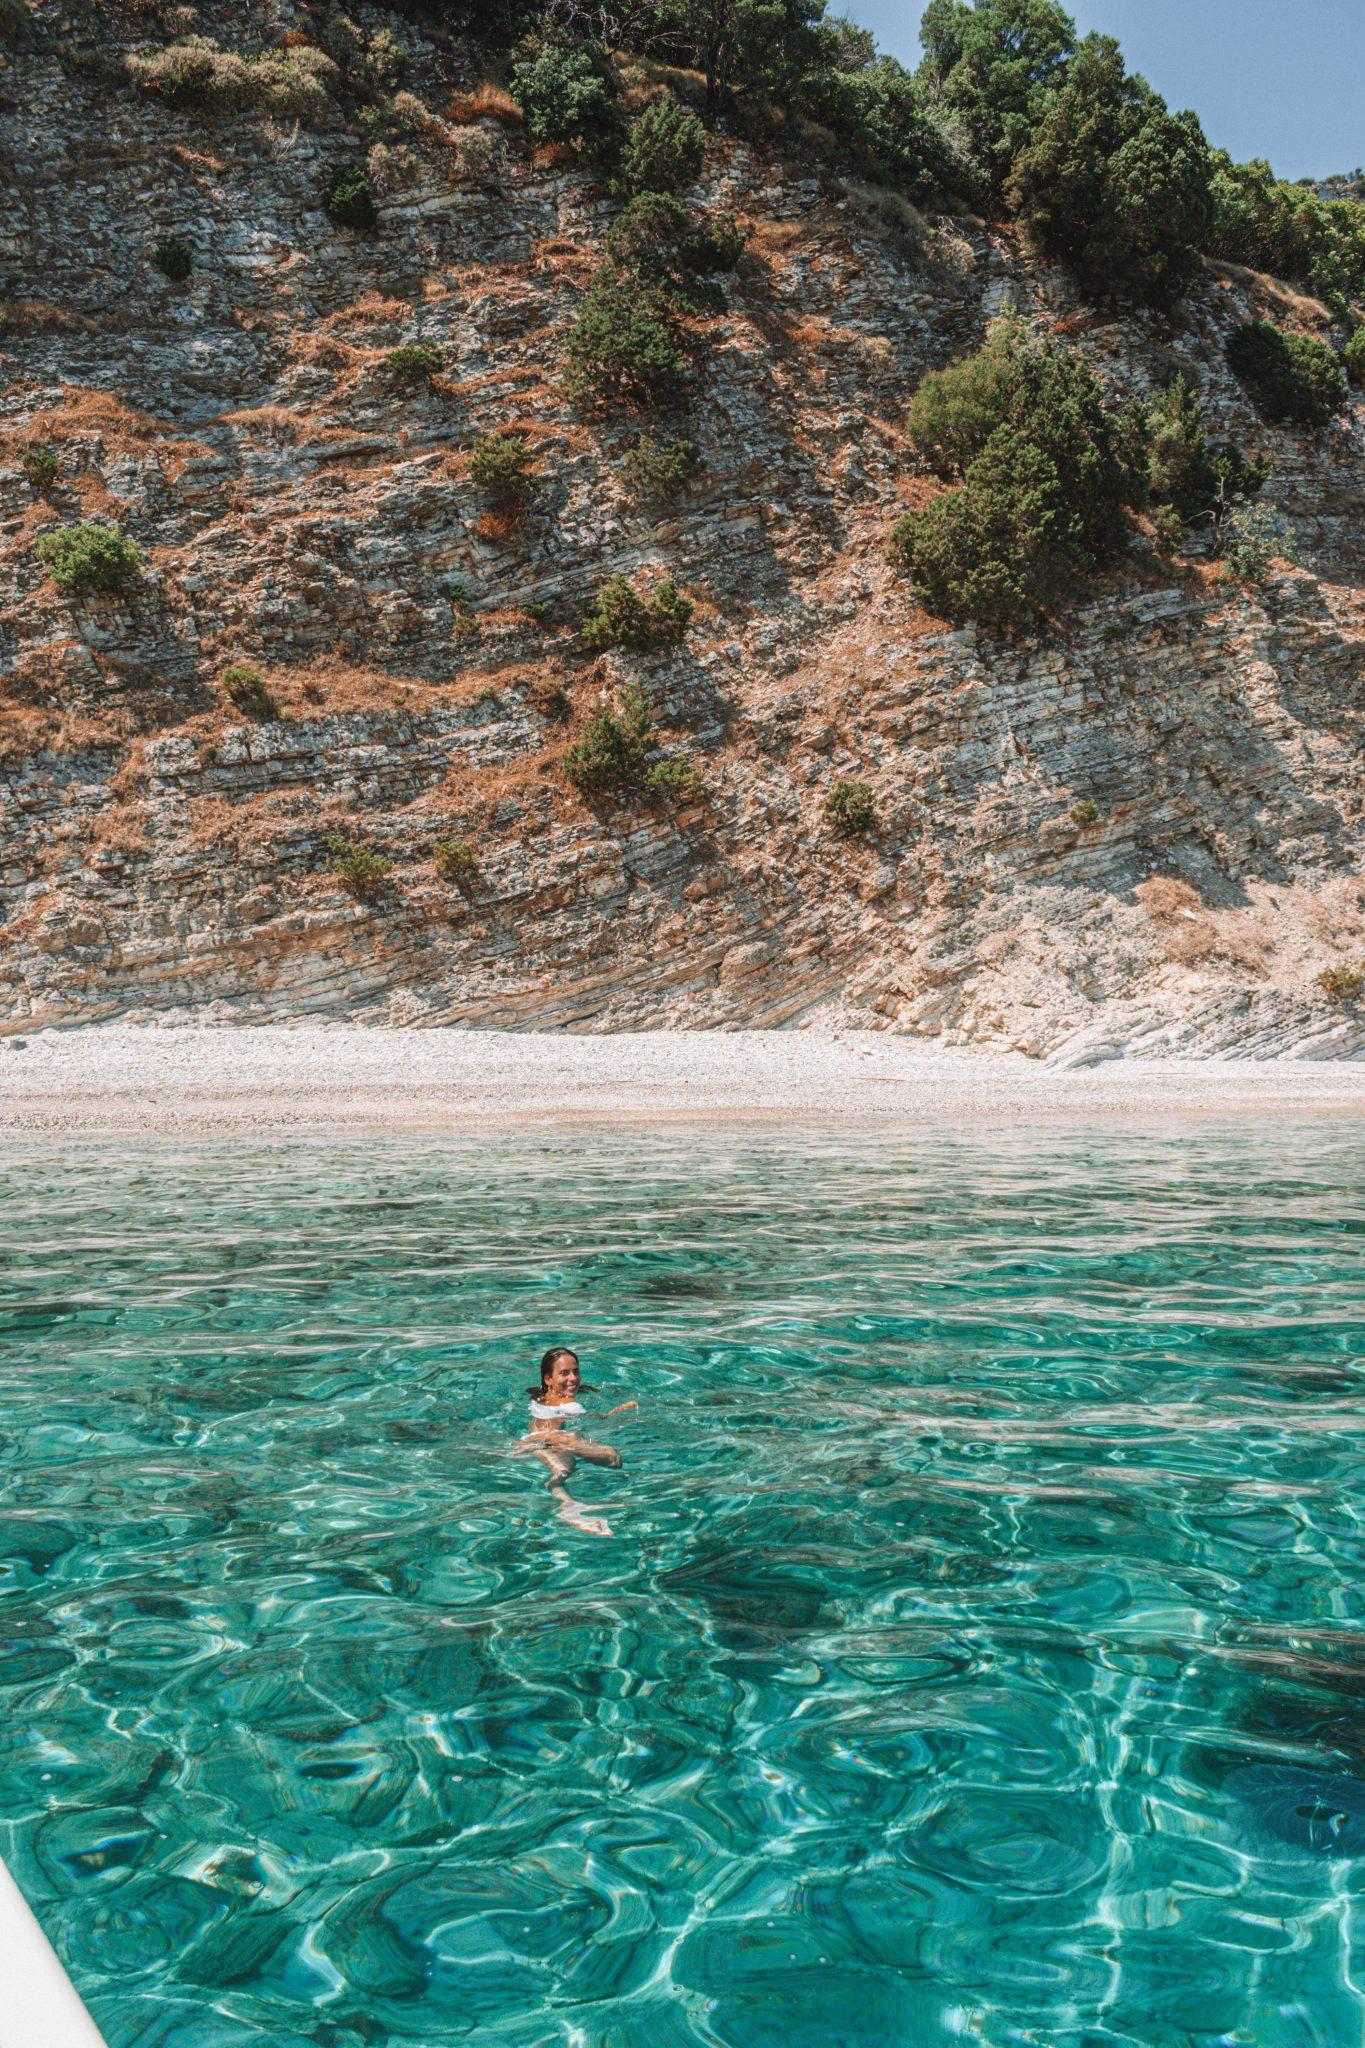 Ilhas jônicas grécia dicas